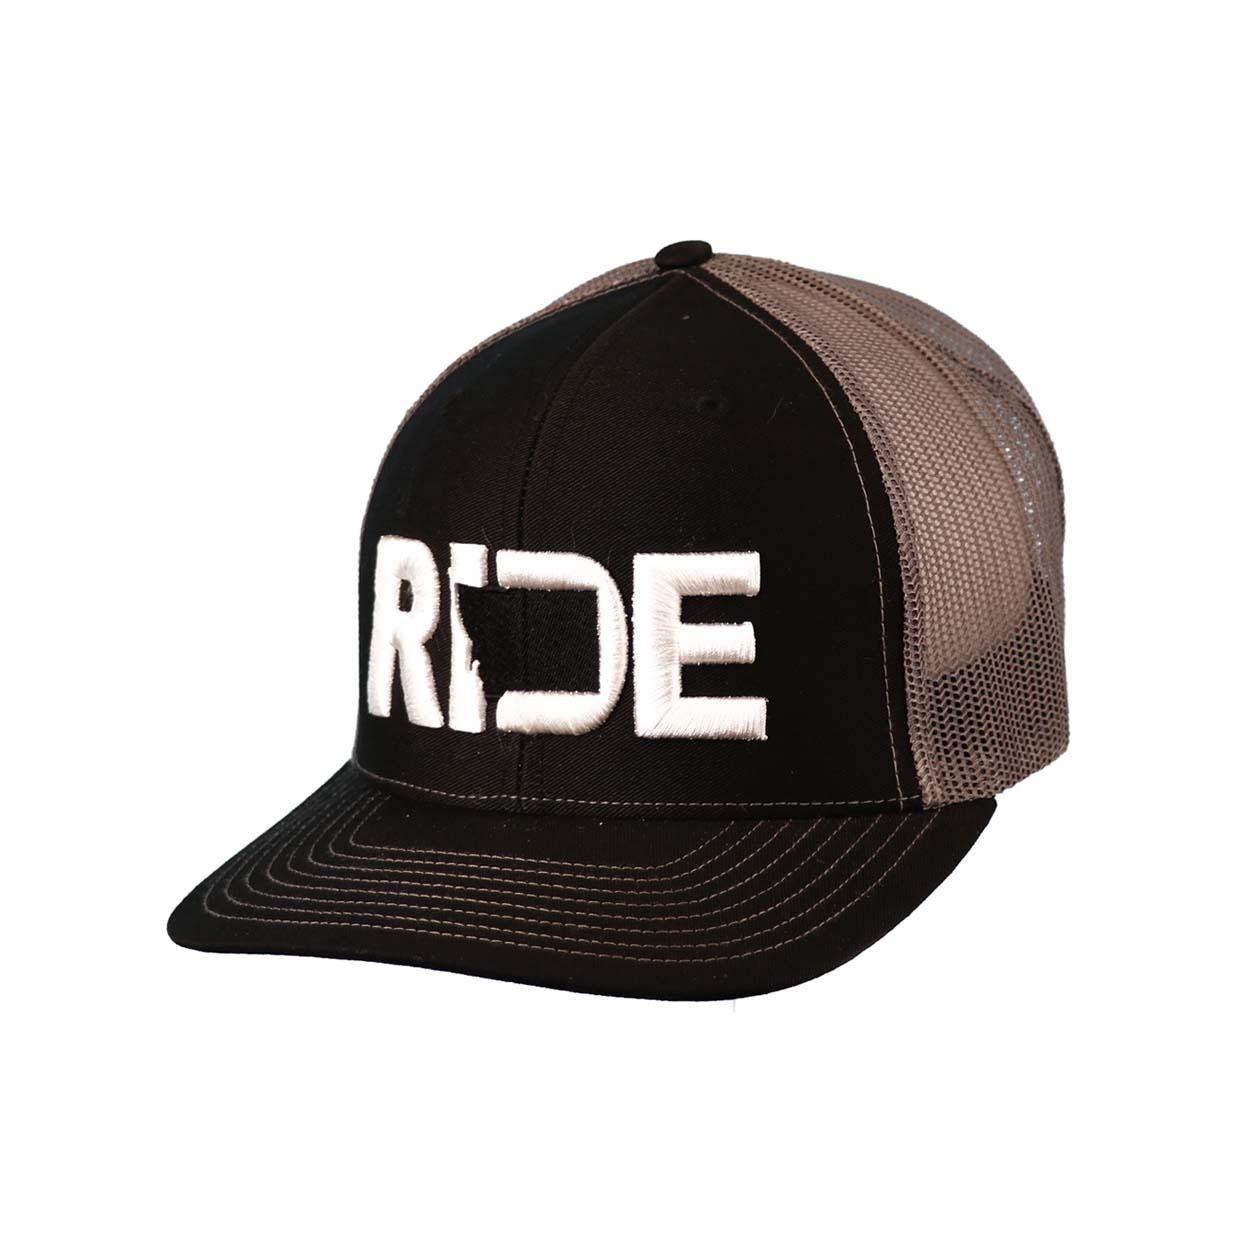 Ride Montana Classic Embroidered Snapback Trucker Hat Black/White